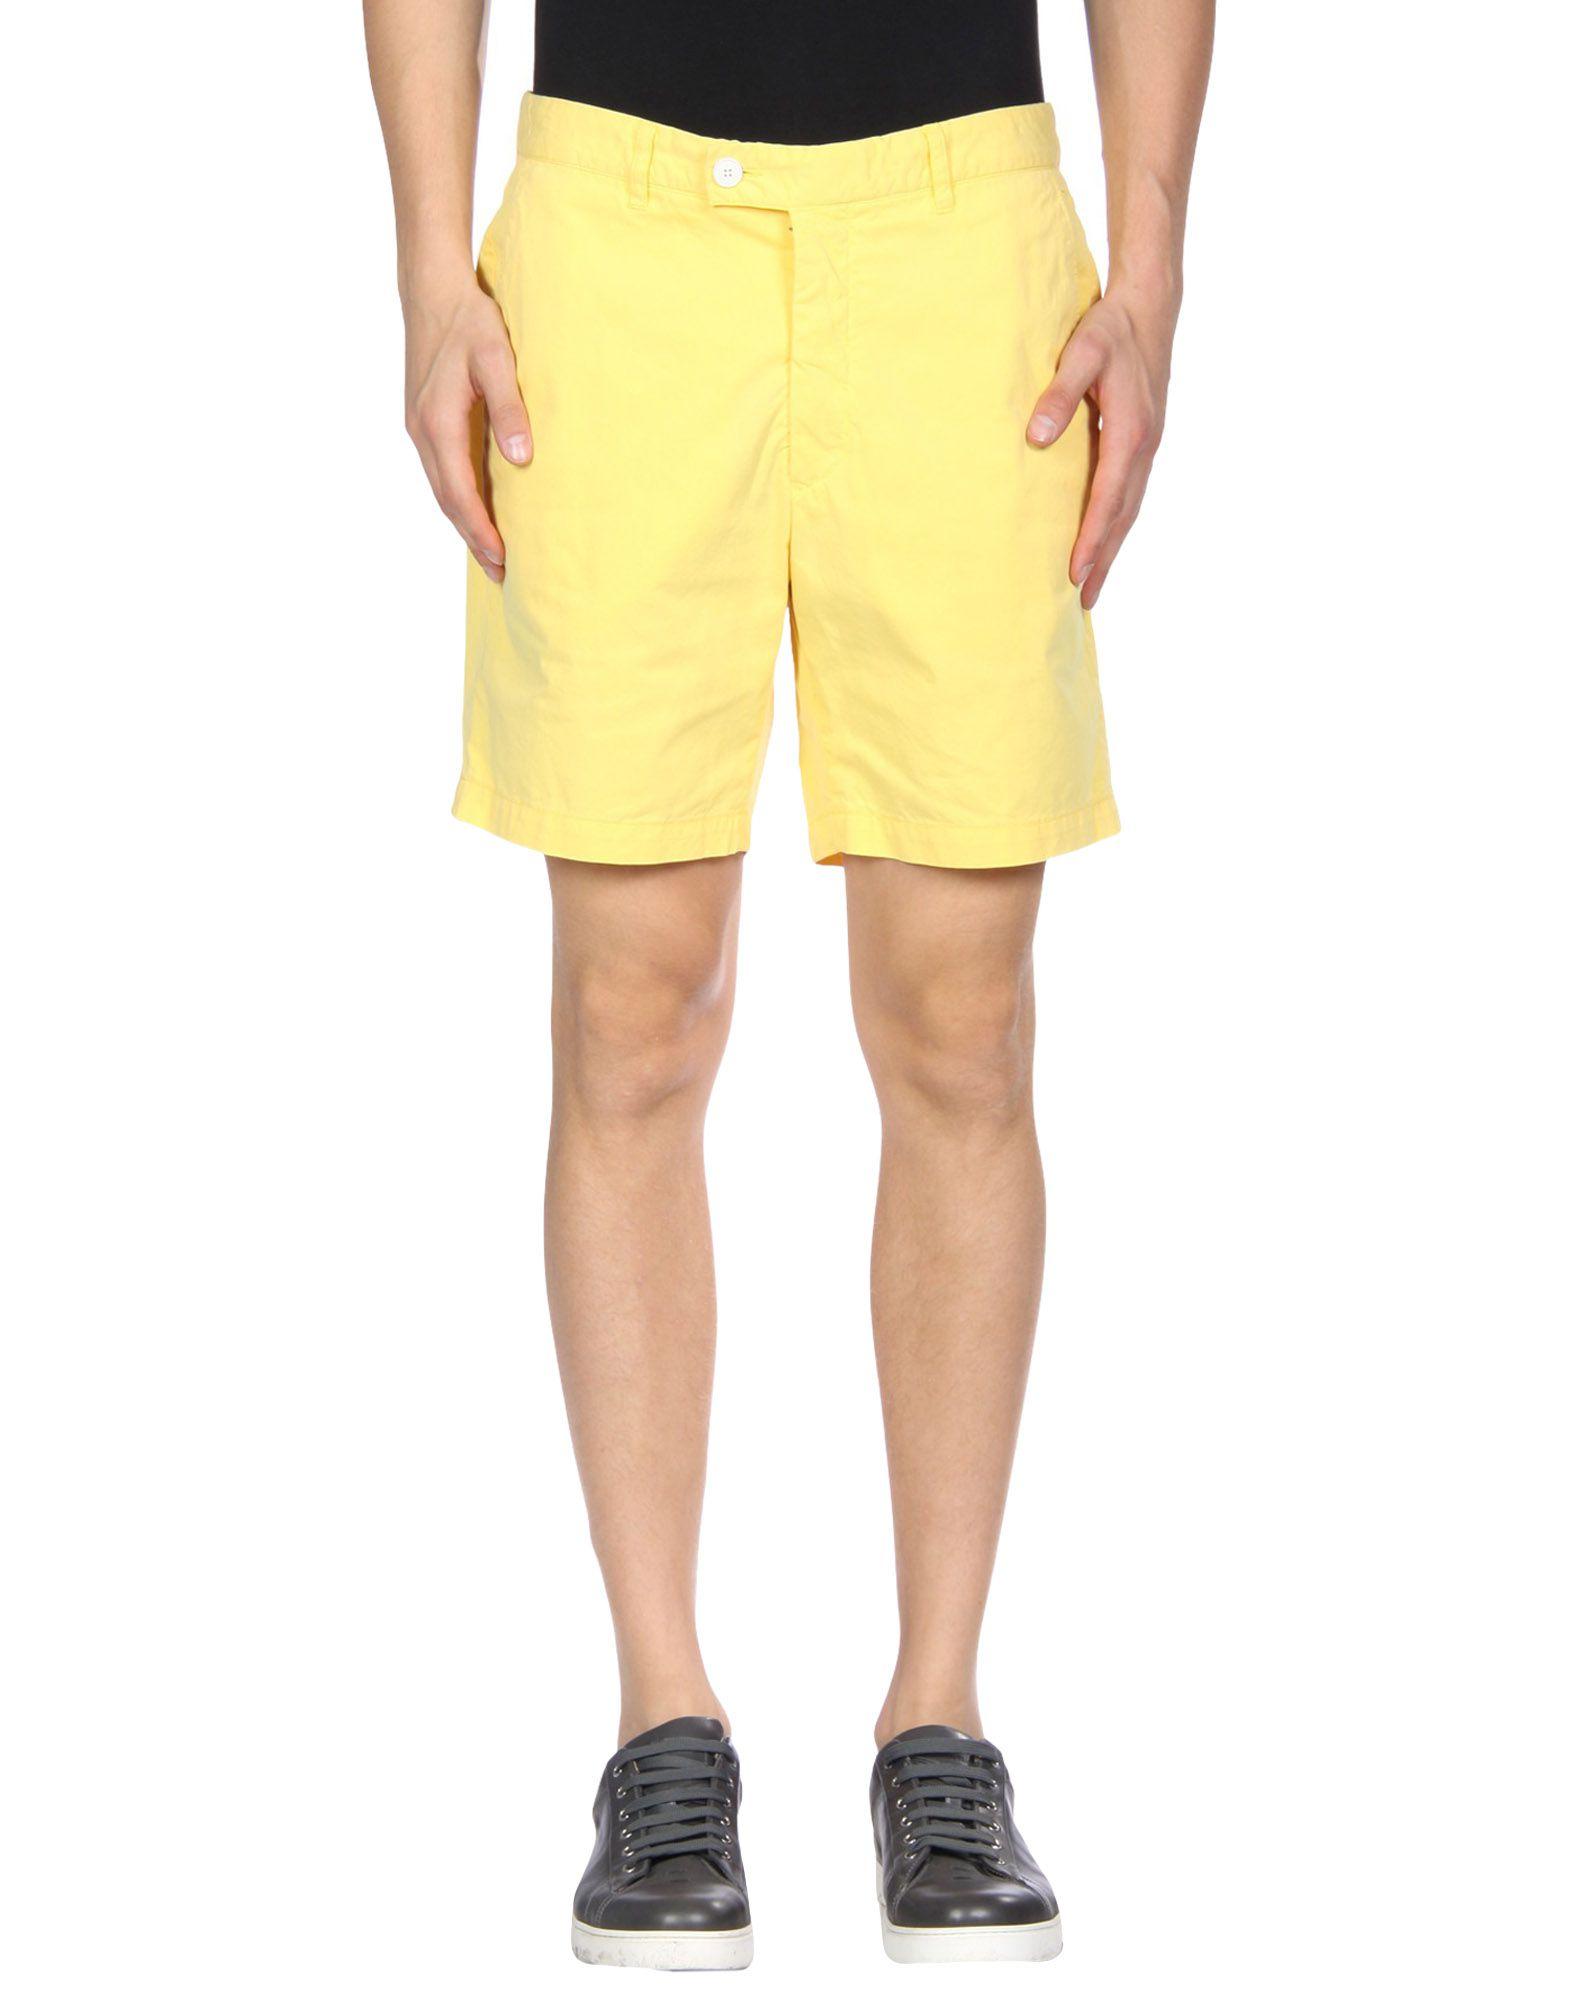 HENTSCH MAN Shorts in Yellow